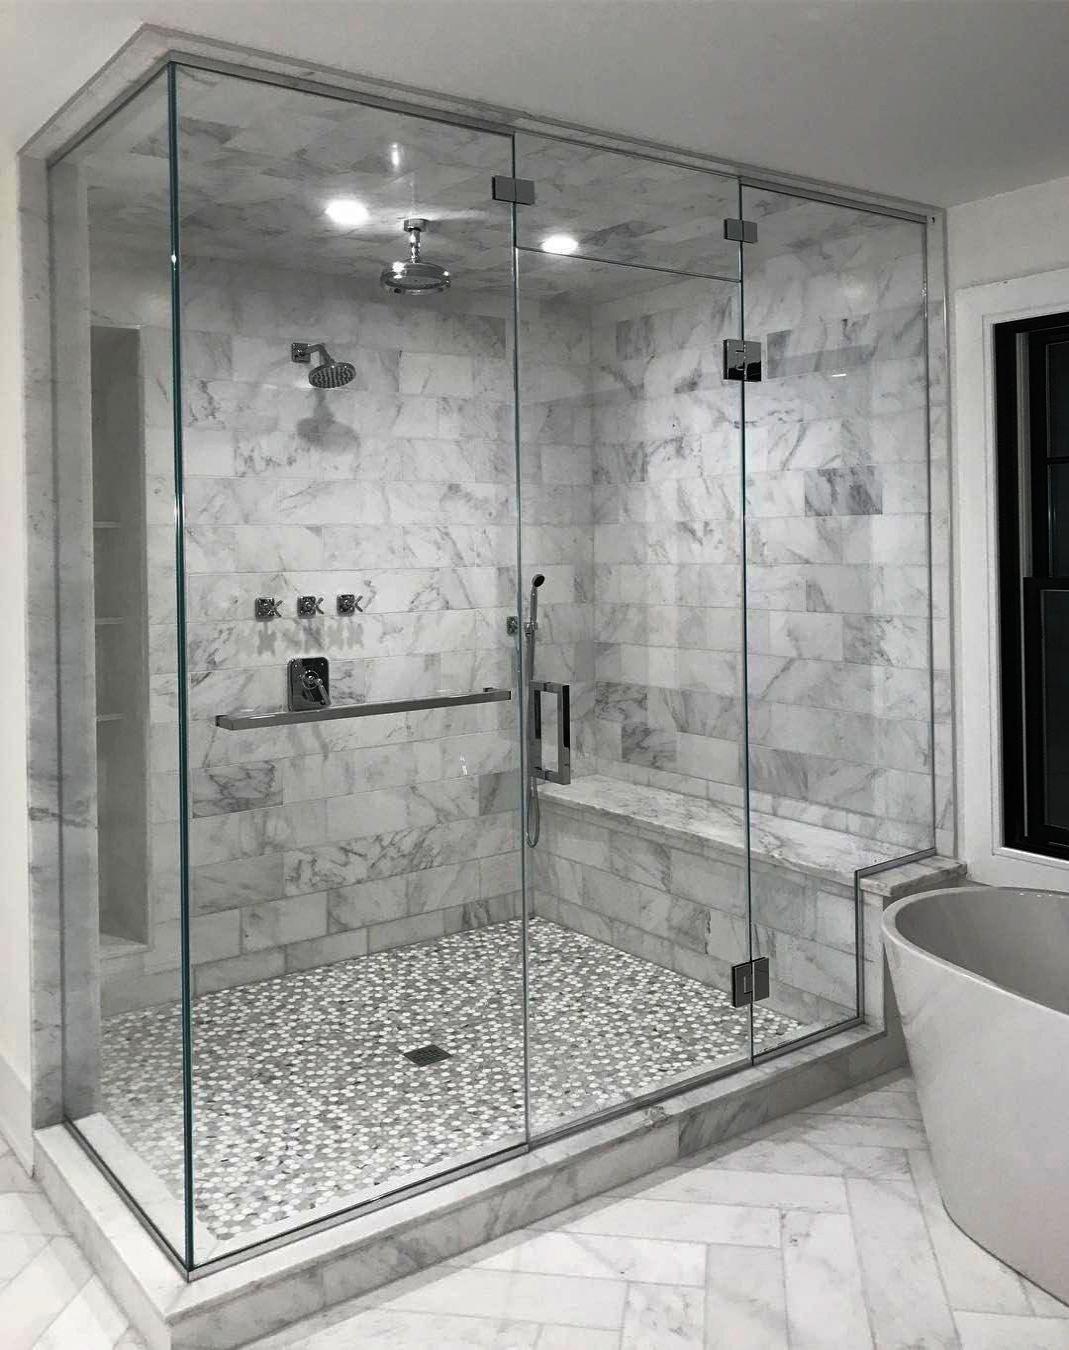 Bathroom Mirror Oil Rubbed Bronze Designing Bathroom In India Plus Bathroom Designs Tiles Ideas Bathroom Remodel Shower Bathroom Layout Master Bathroom Design